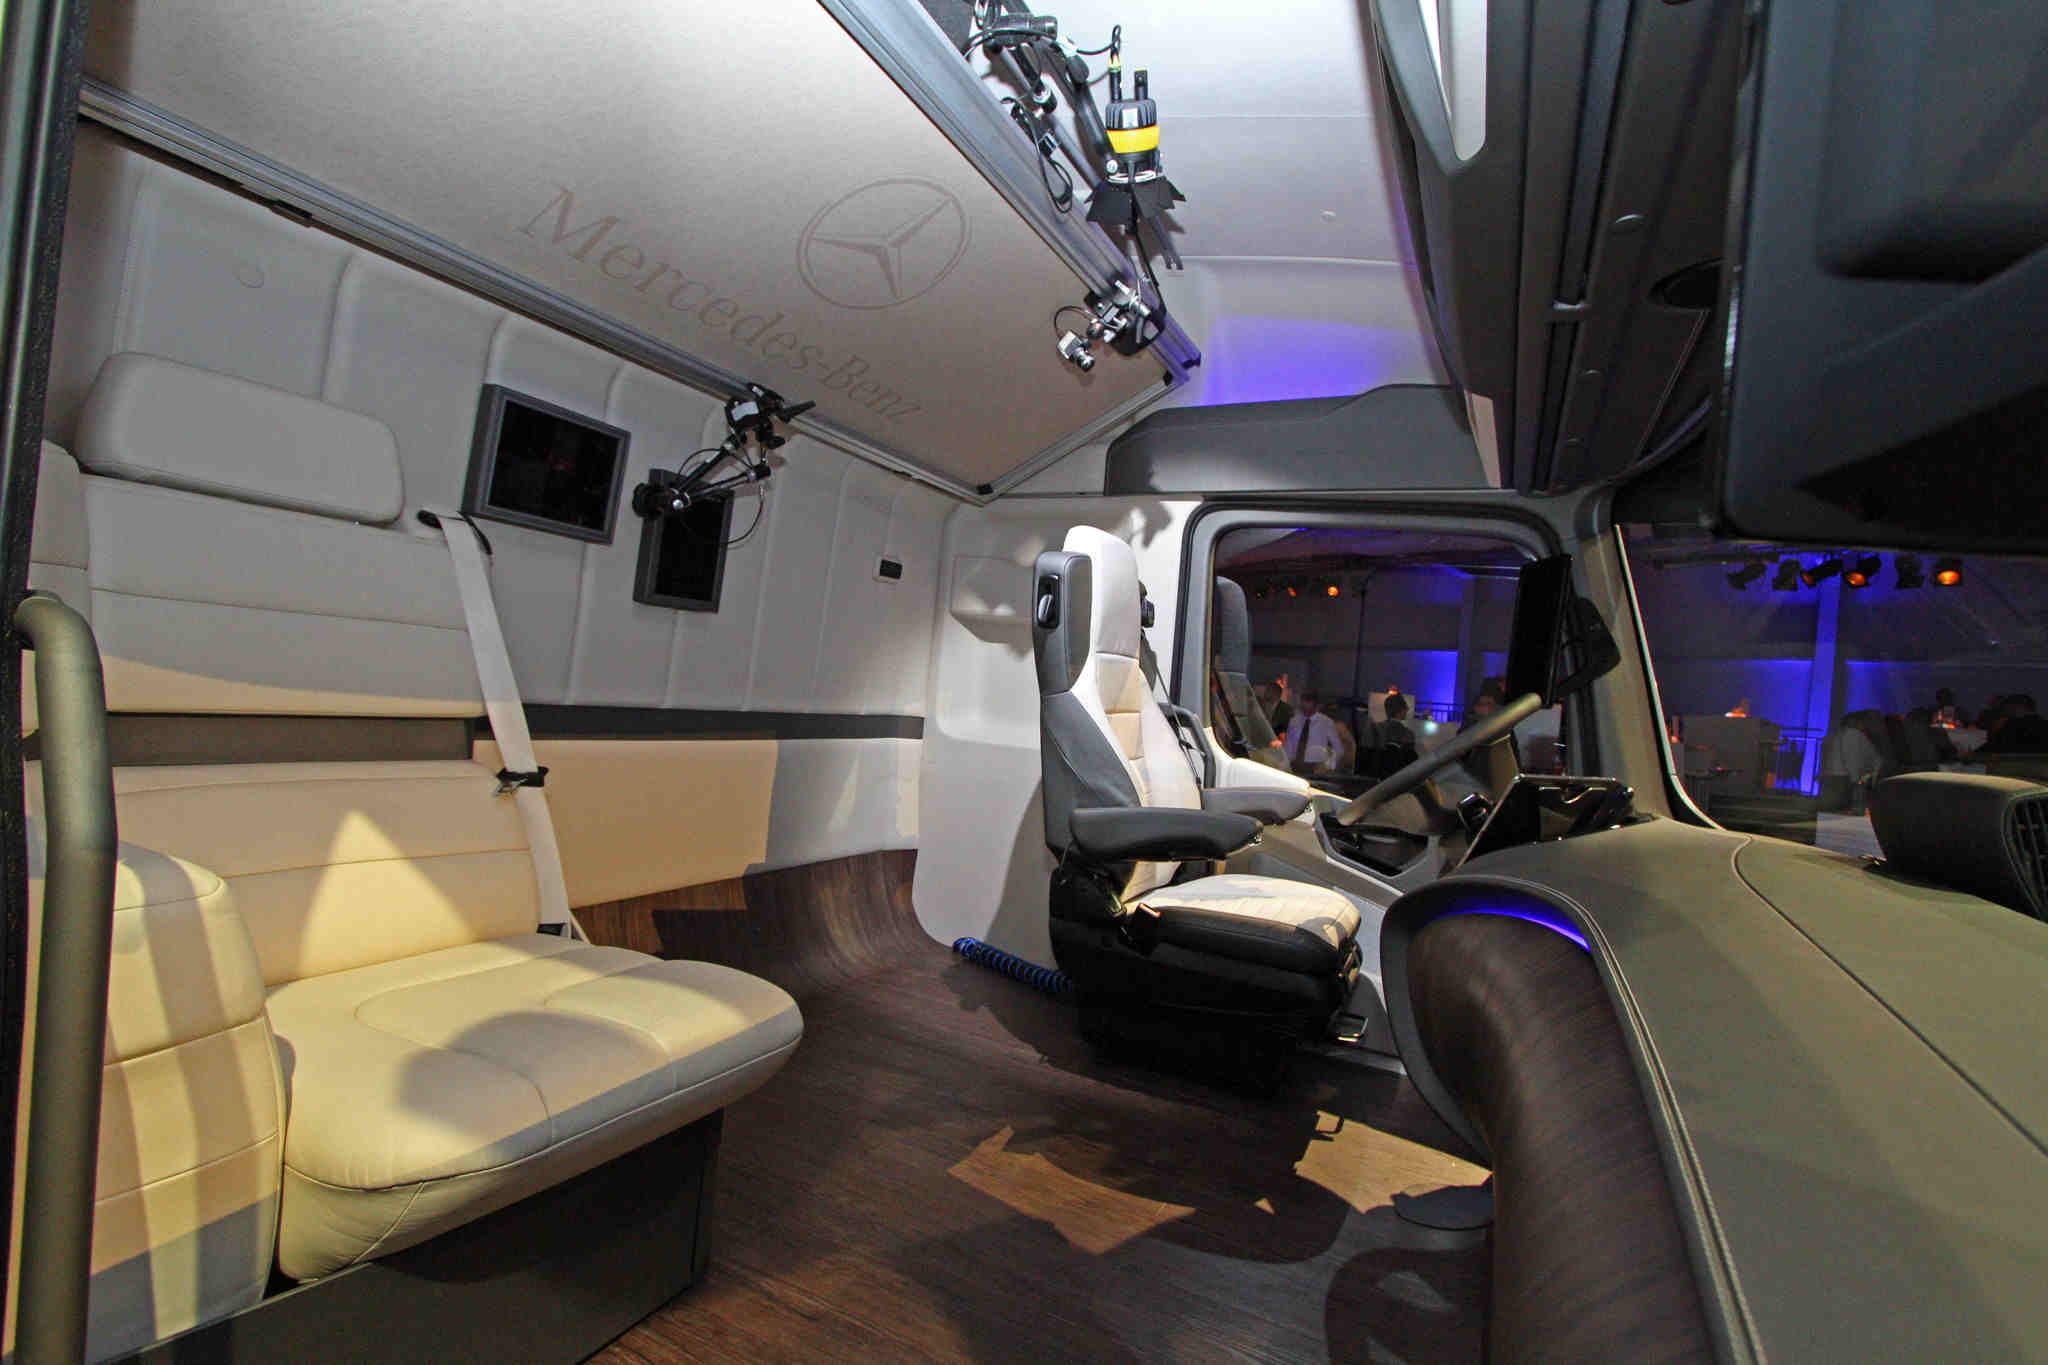 mercedes-benz future truck 2025 makes its debut at the iaa